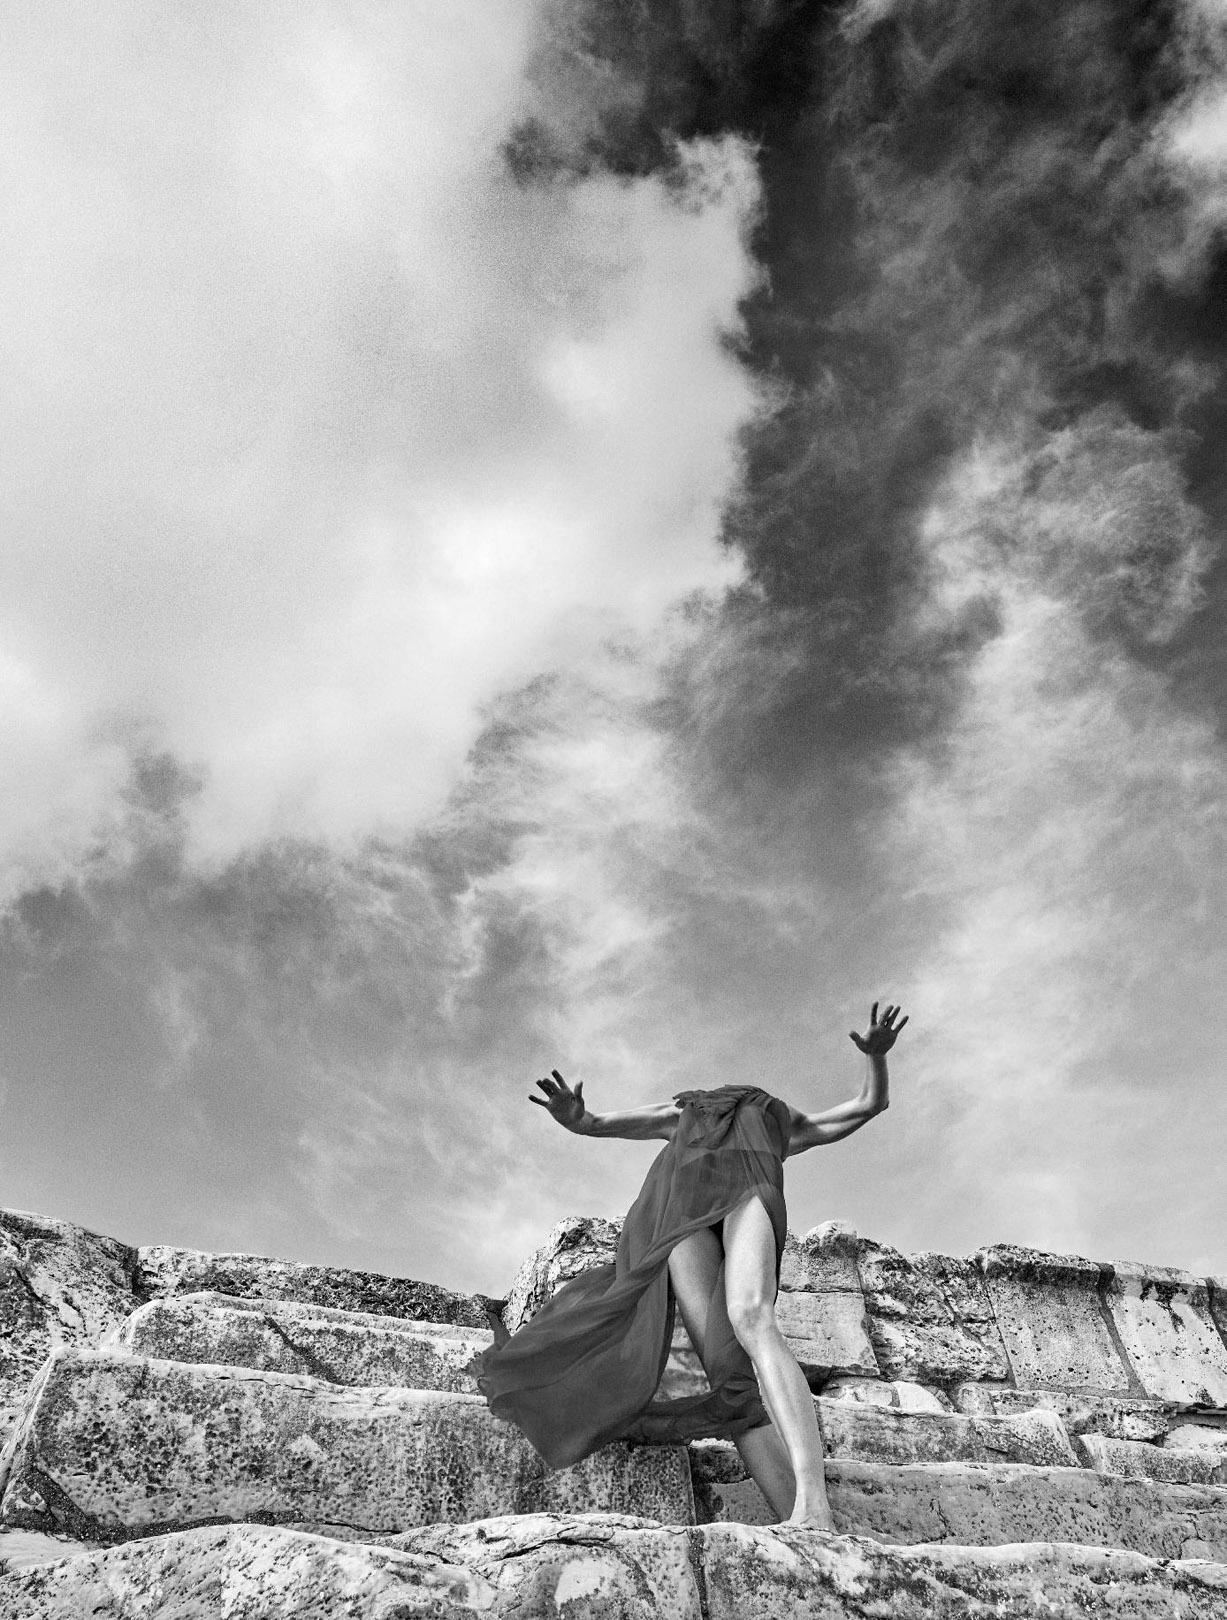 Danse / Marie-Agnes Gillot by Koto Bolofo / Numero-193 may 2018